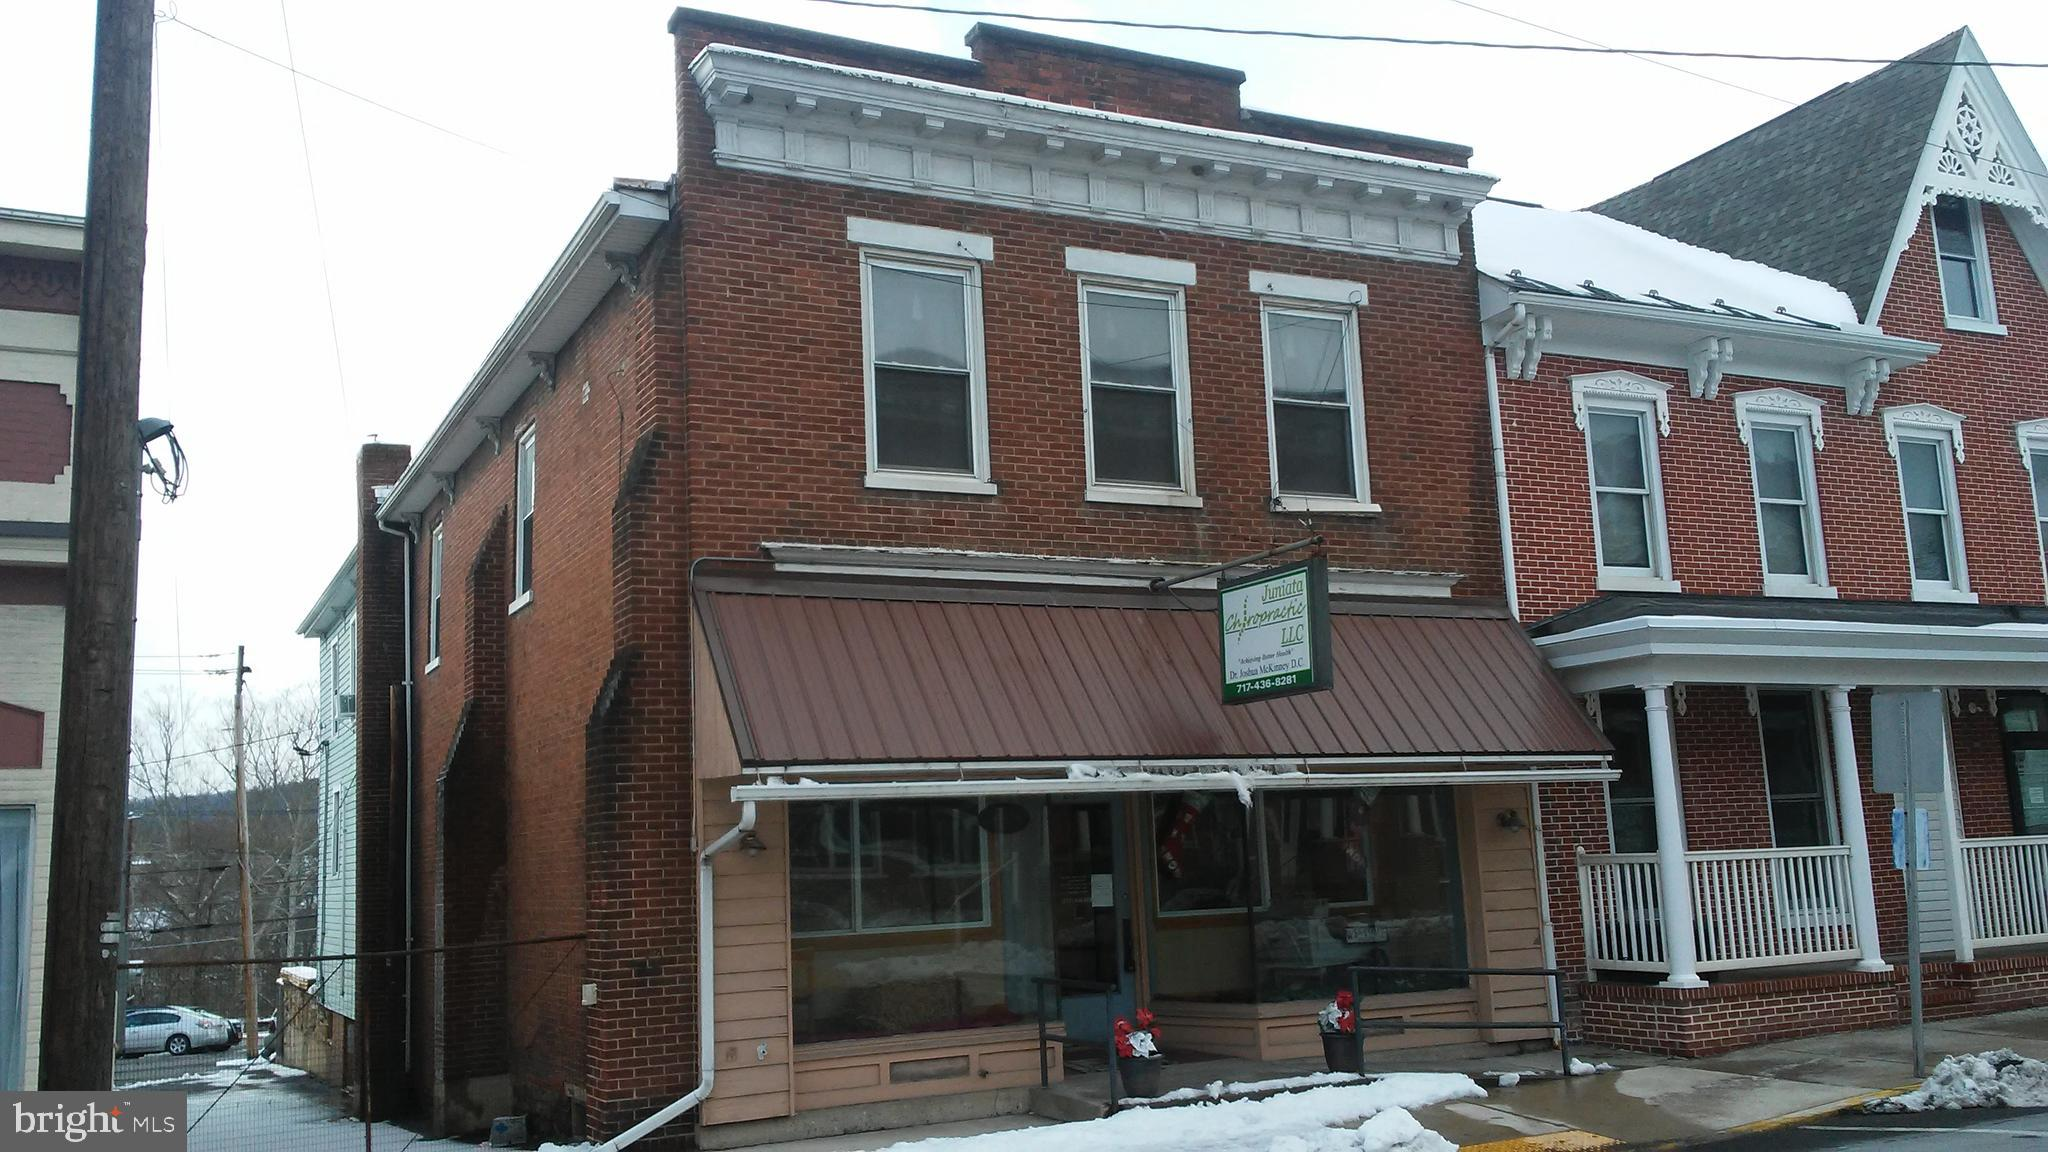 22 N MAIN STREET, MIFFLINTOWN, PA 17059